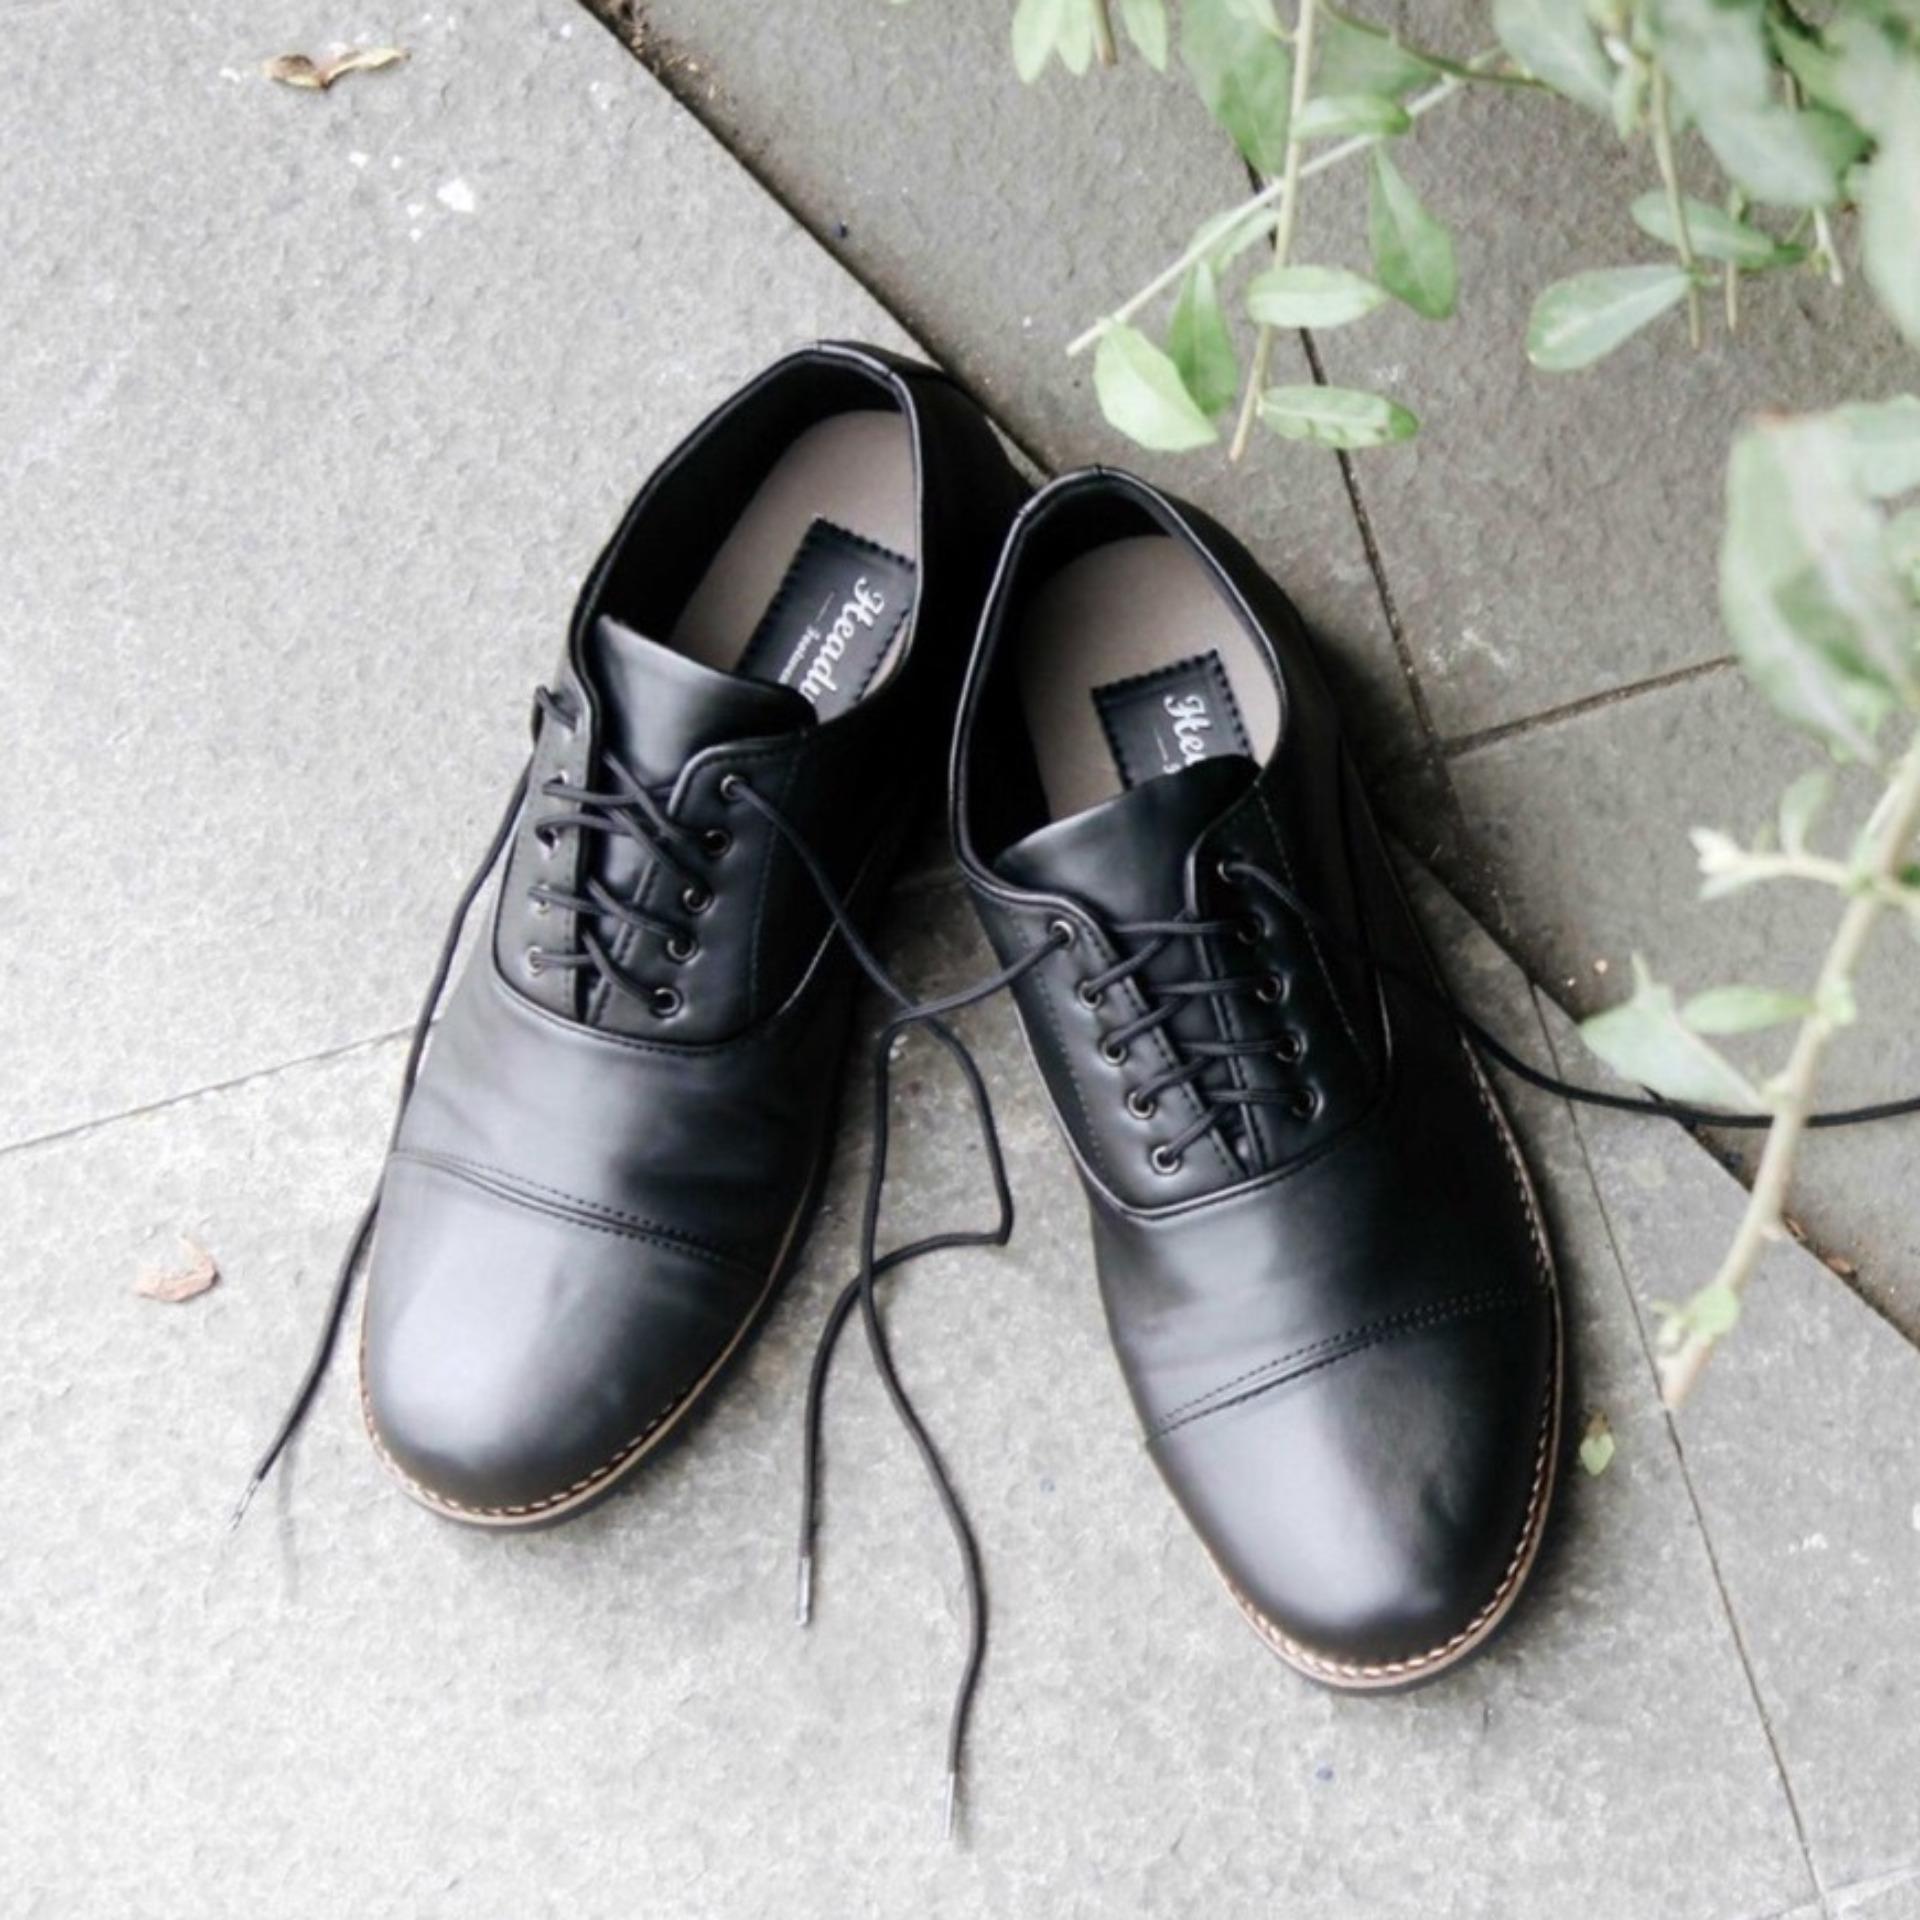 Jual Sepatu Formal Casual Pria Zuckerberg Headway Black Original